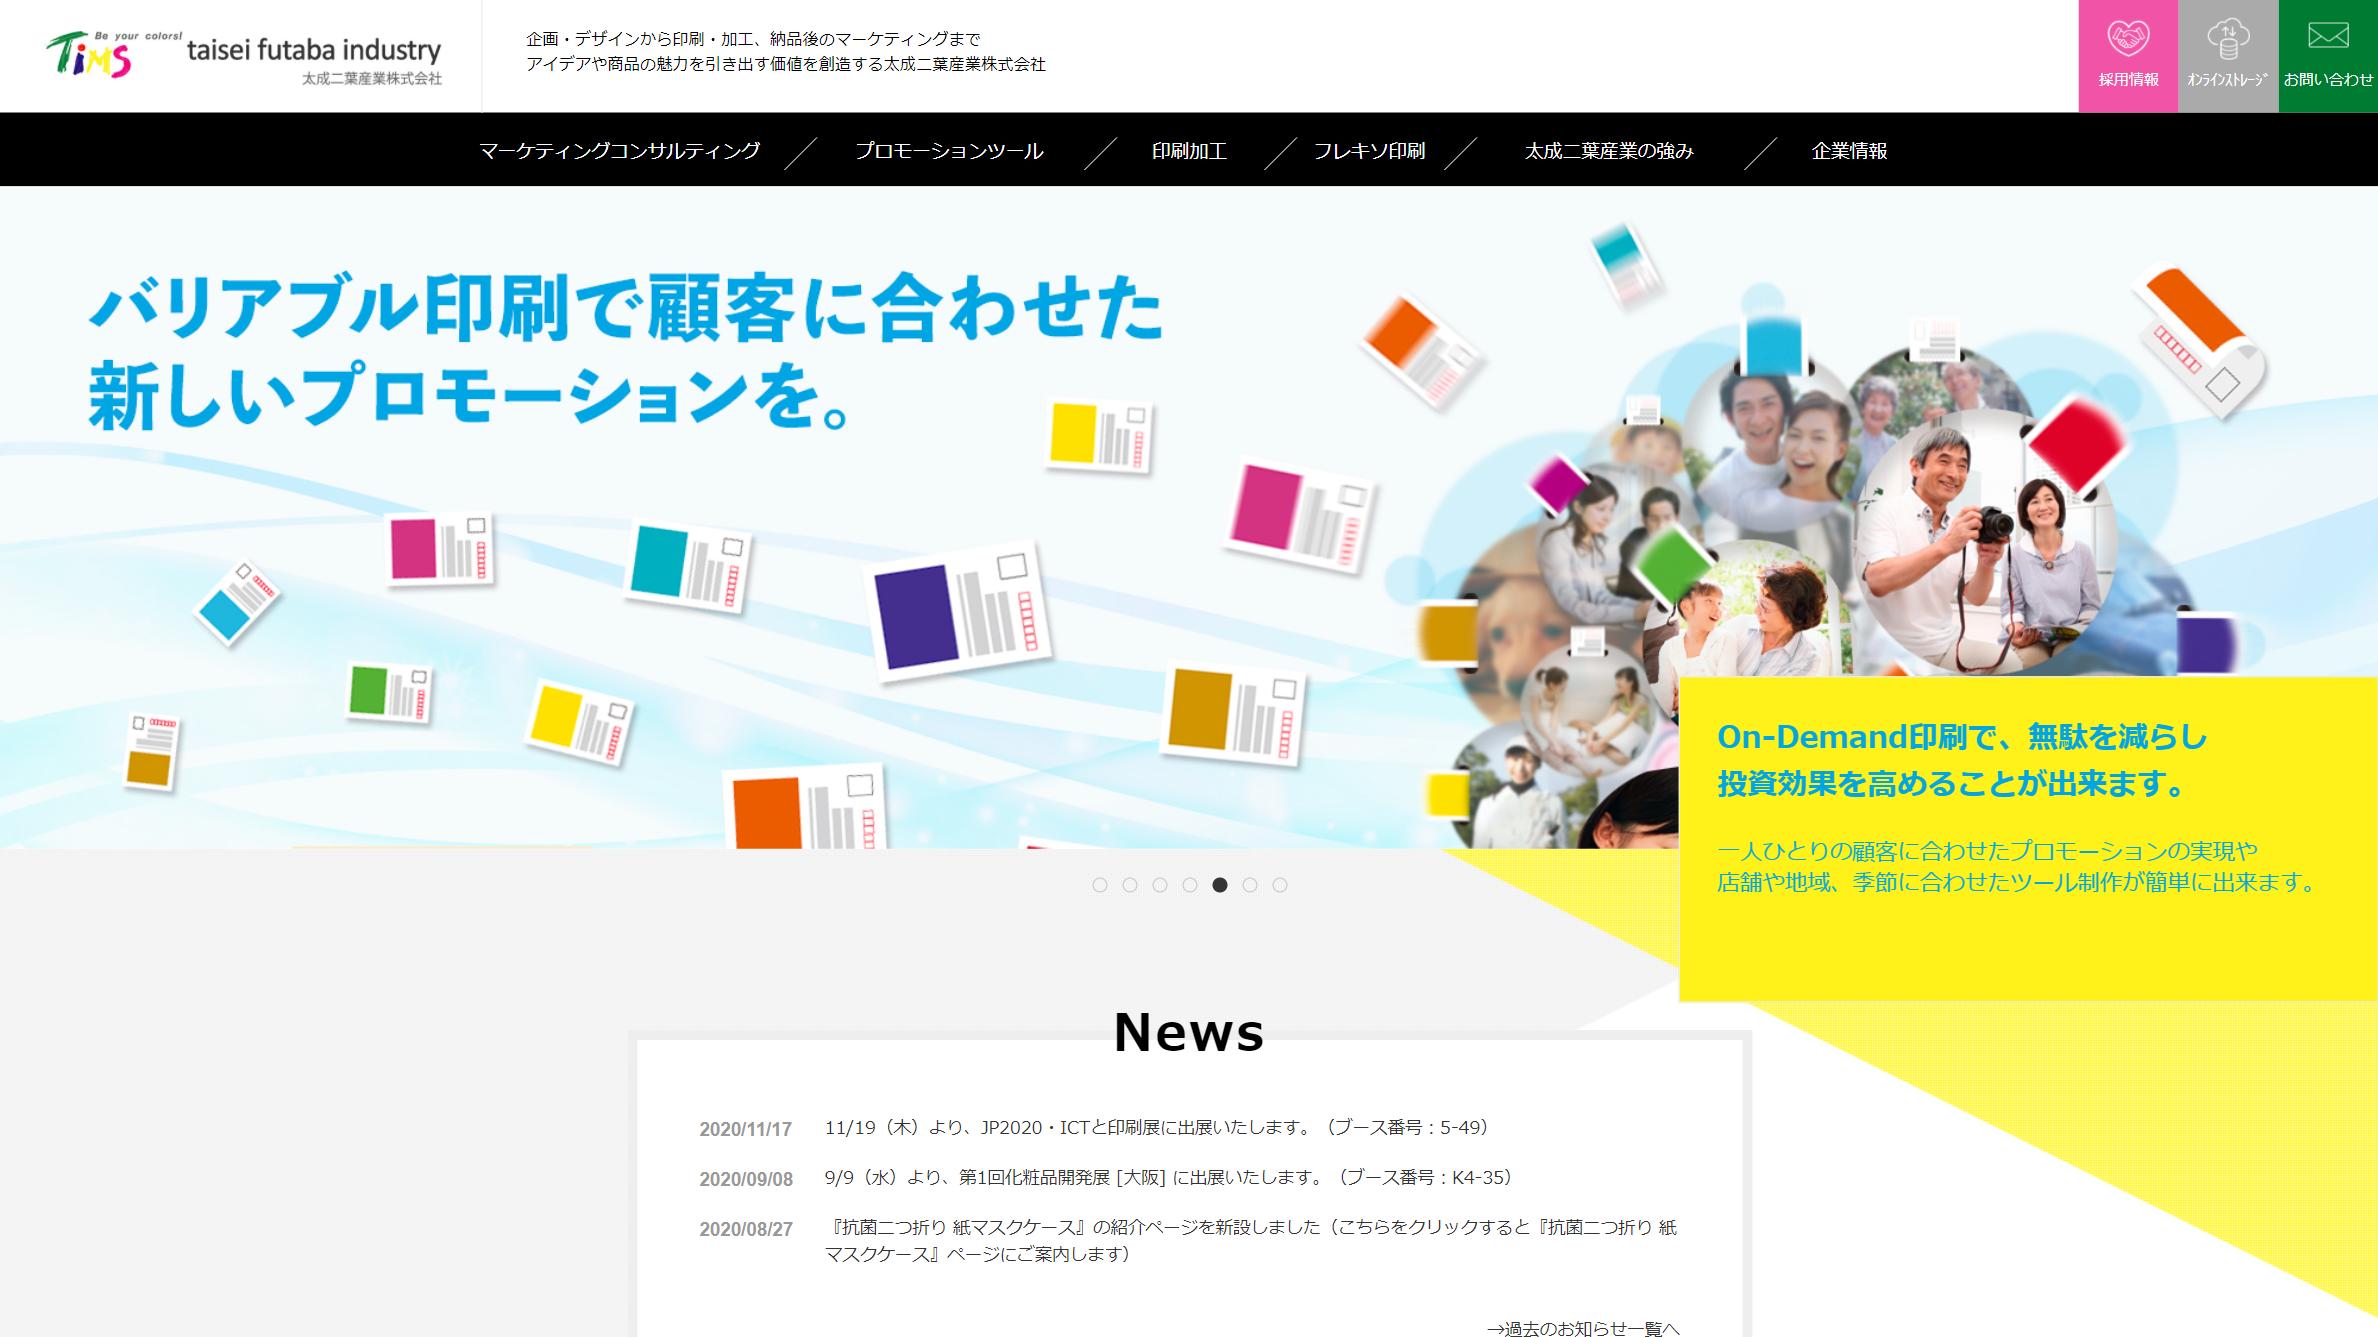 WebサイトリニューアルとCMS「BlueMonkey」導入で、更新性を大幅に改善!